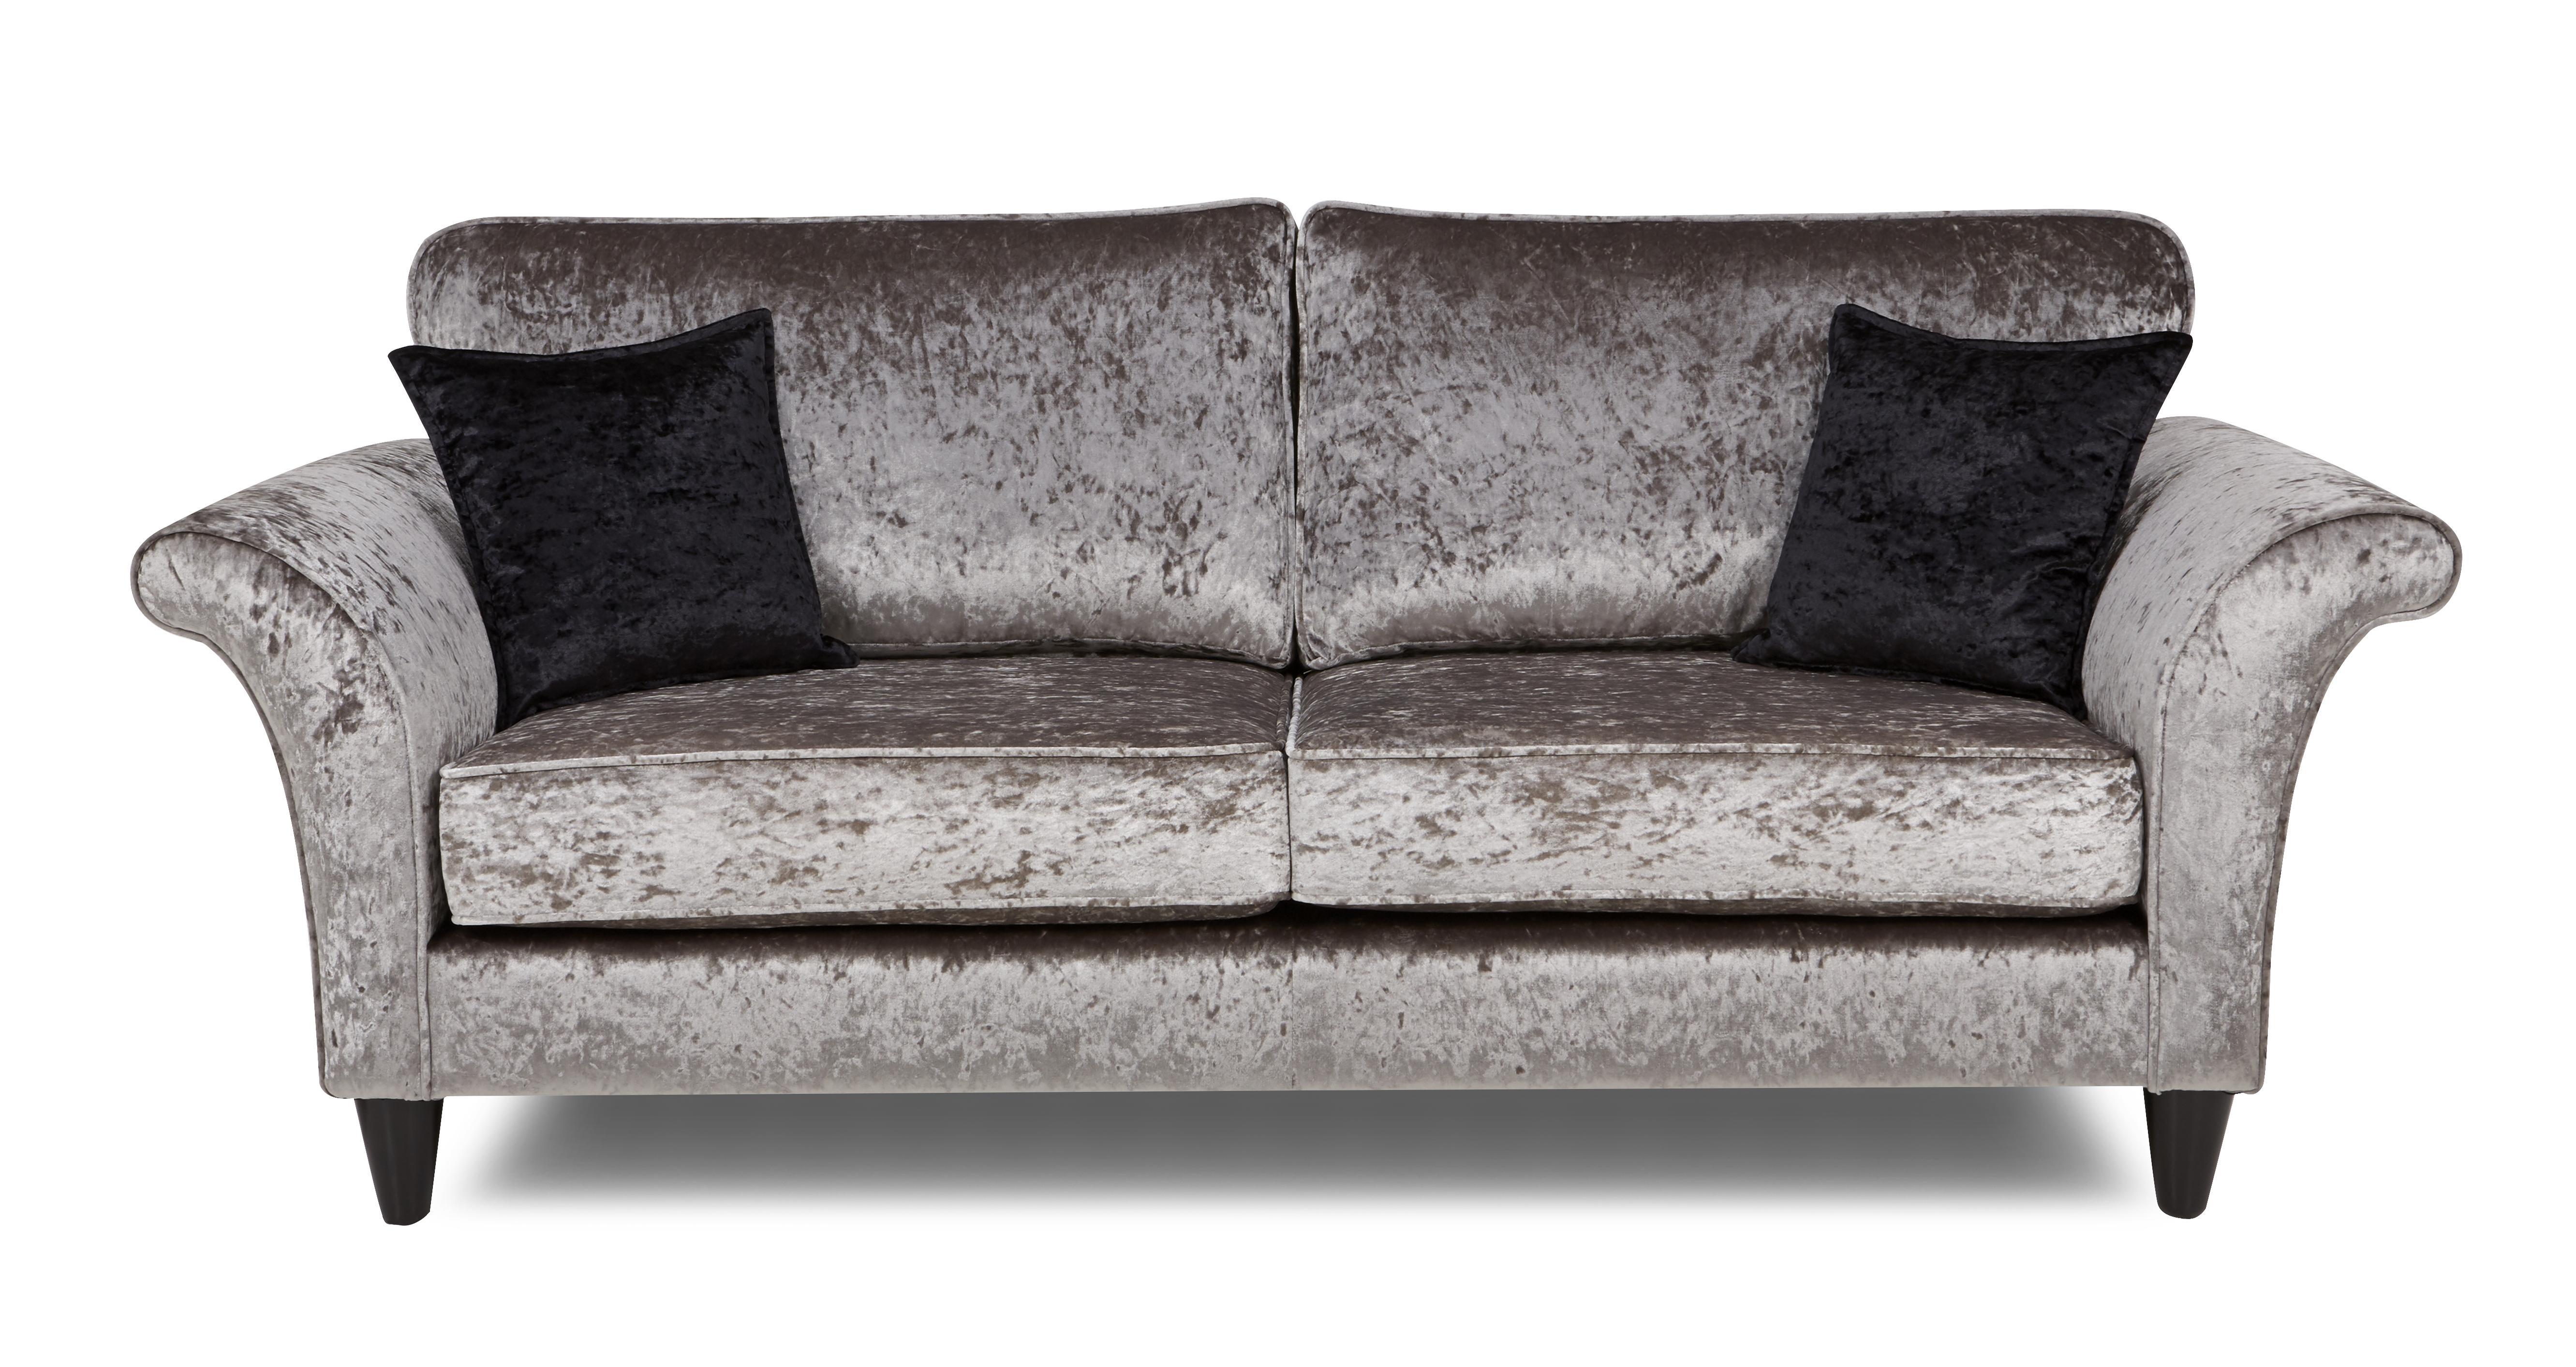 Etoile 3 Seater Formal Back Sofa Krystal